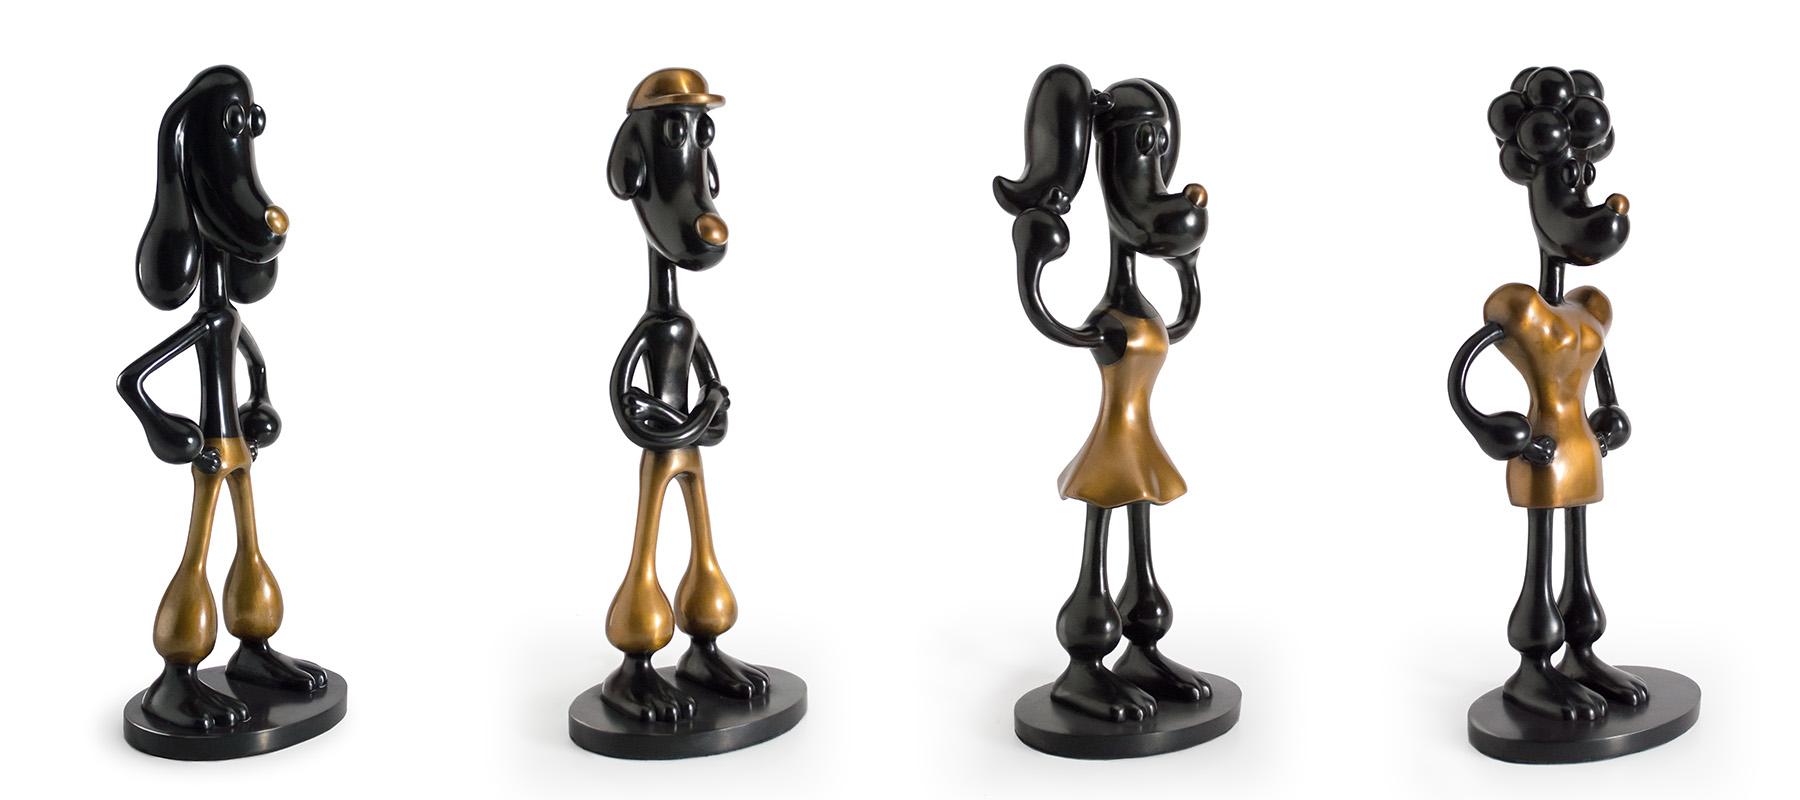 All Black and bronze cartoon dog sculpture, Mounted on black patina bronze base